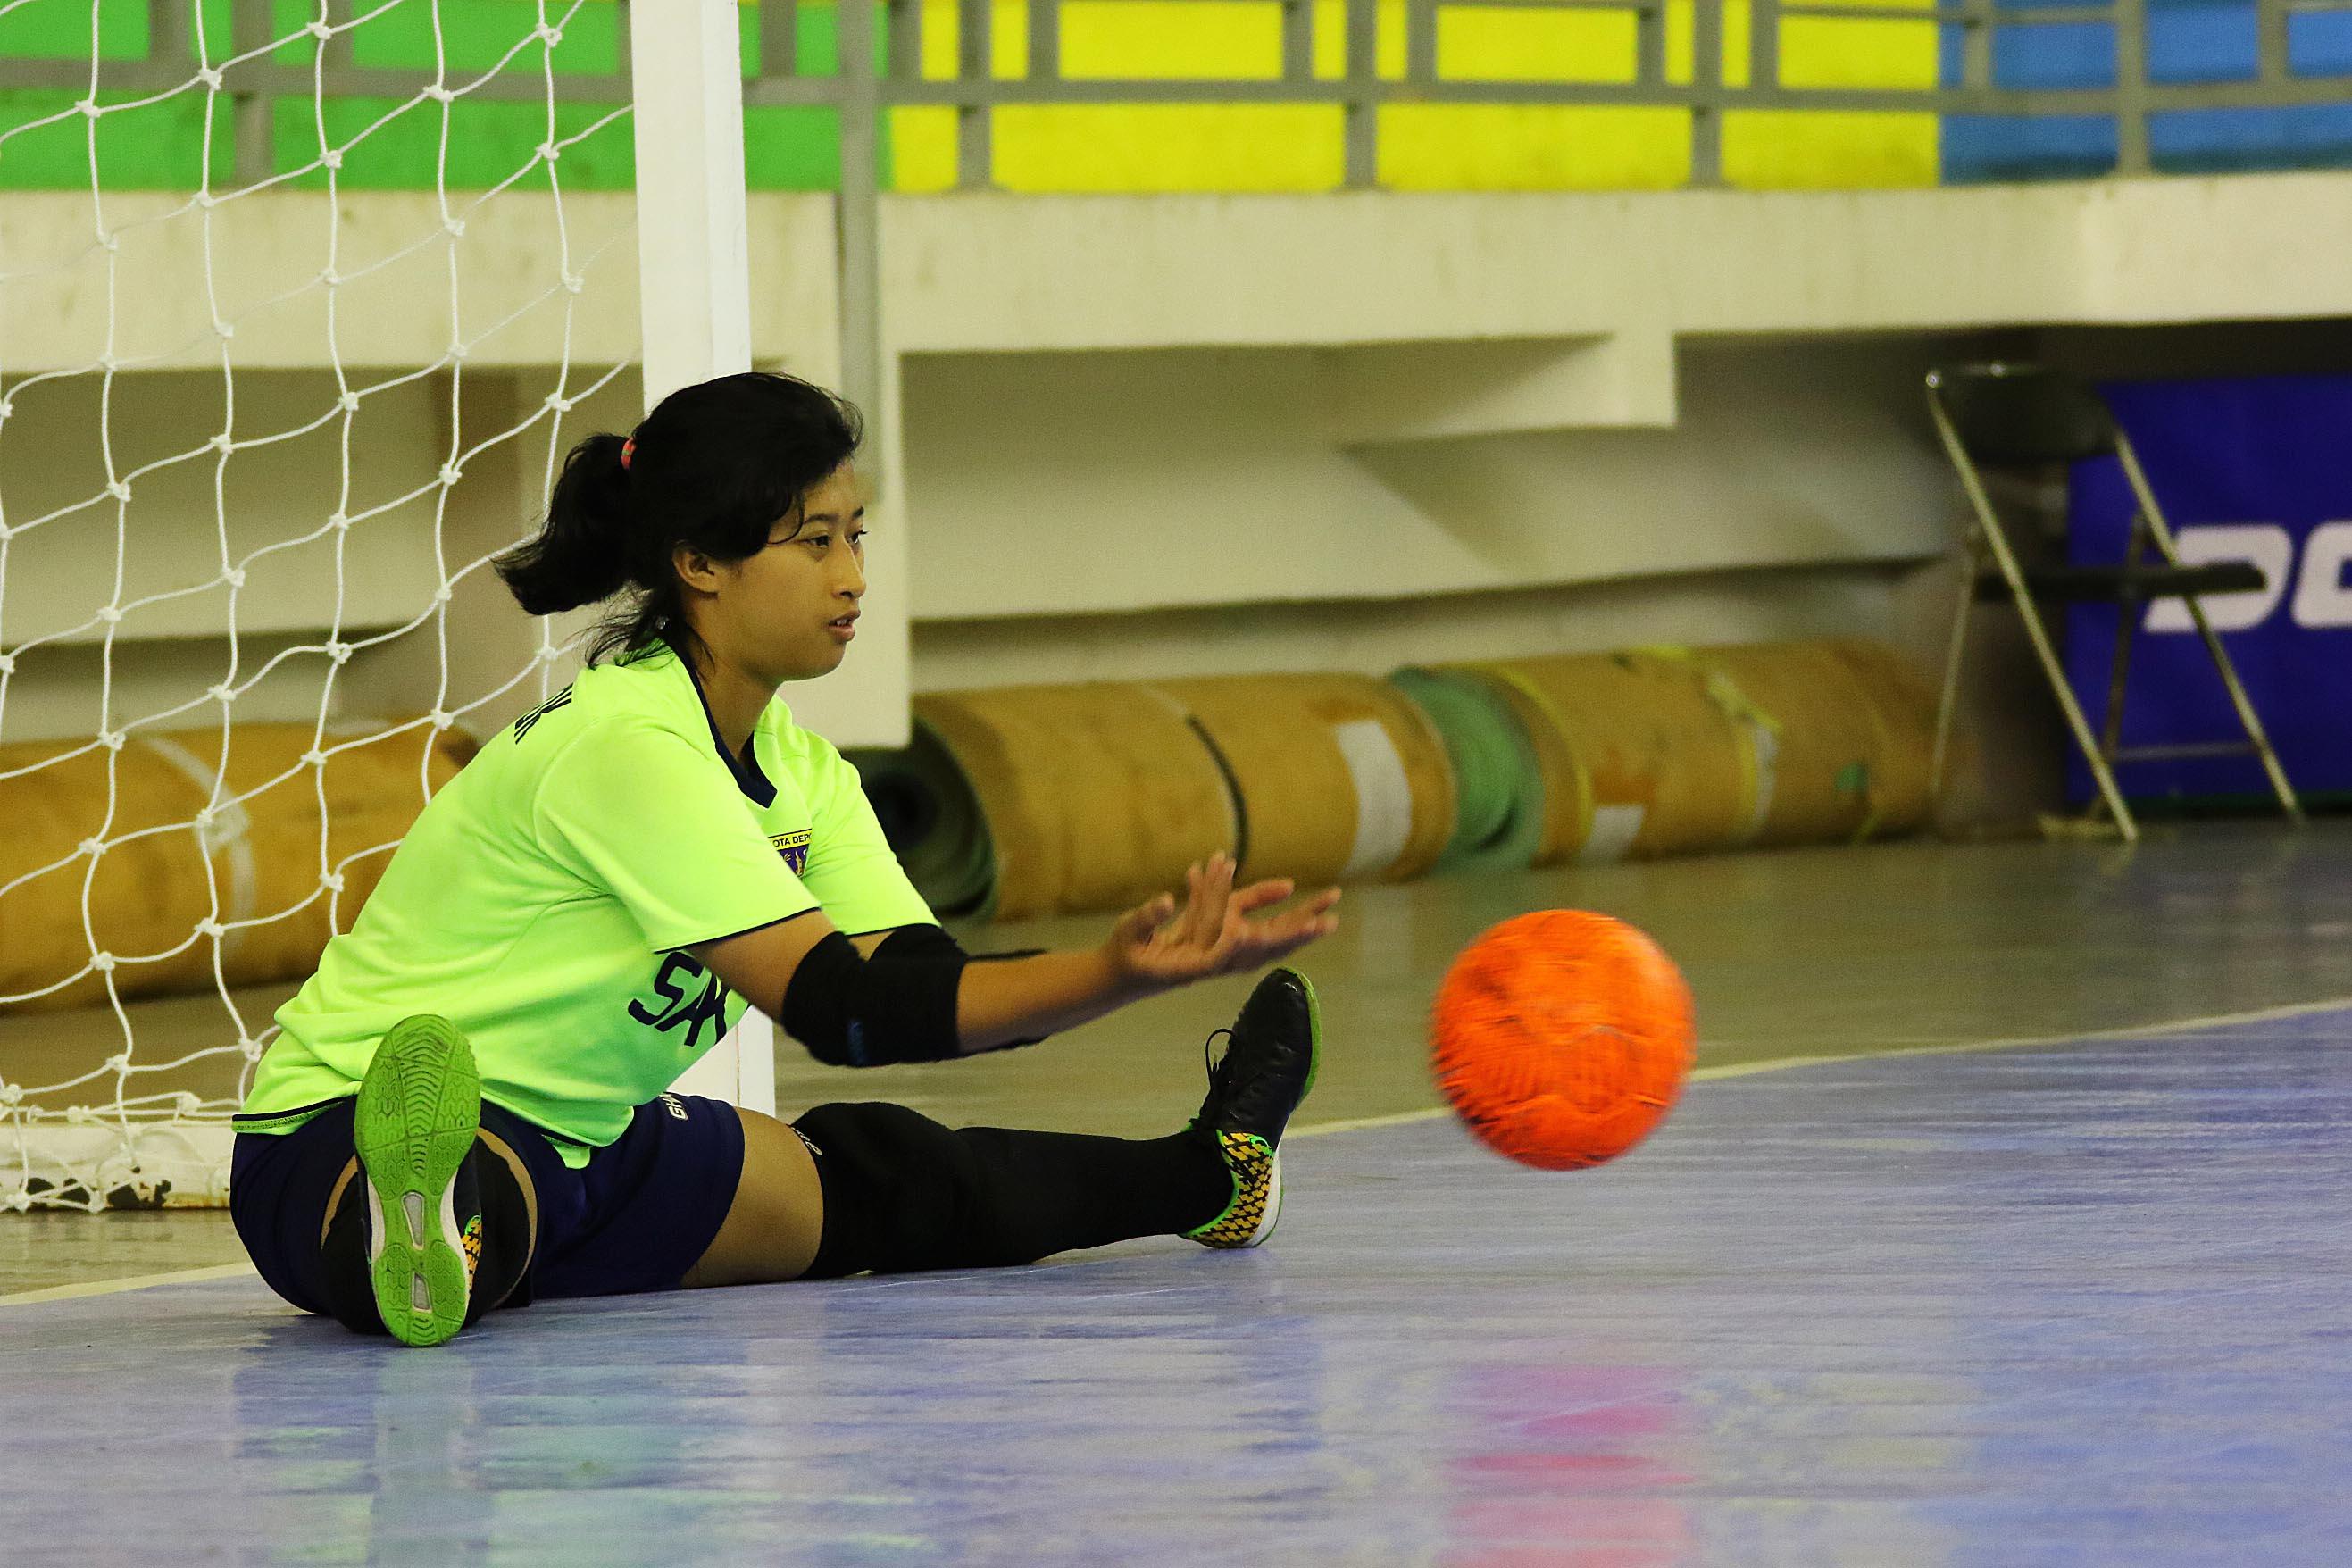 Ria Ayu Prastika Kiper Futsal putri saat melakukan streching sebelum bertanding